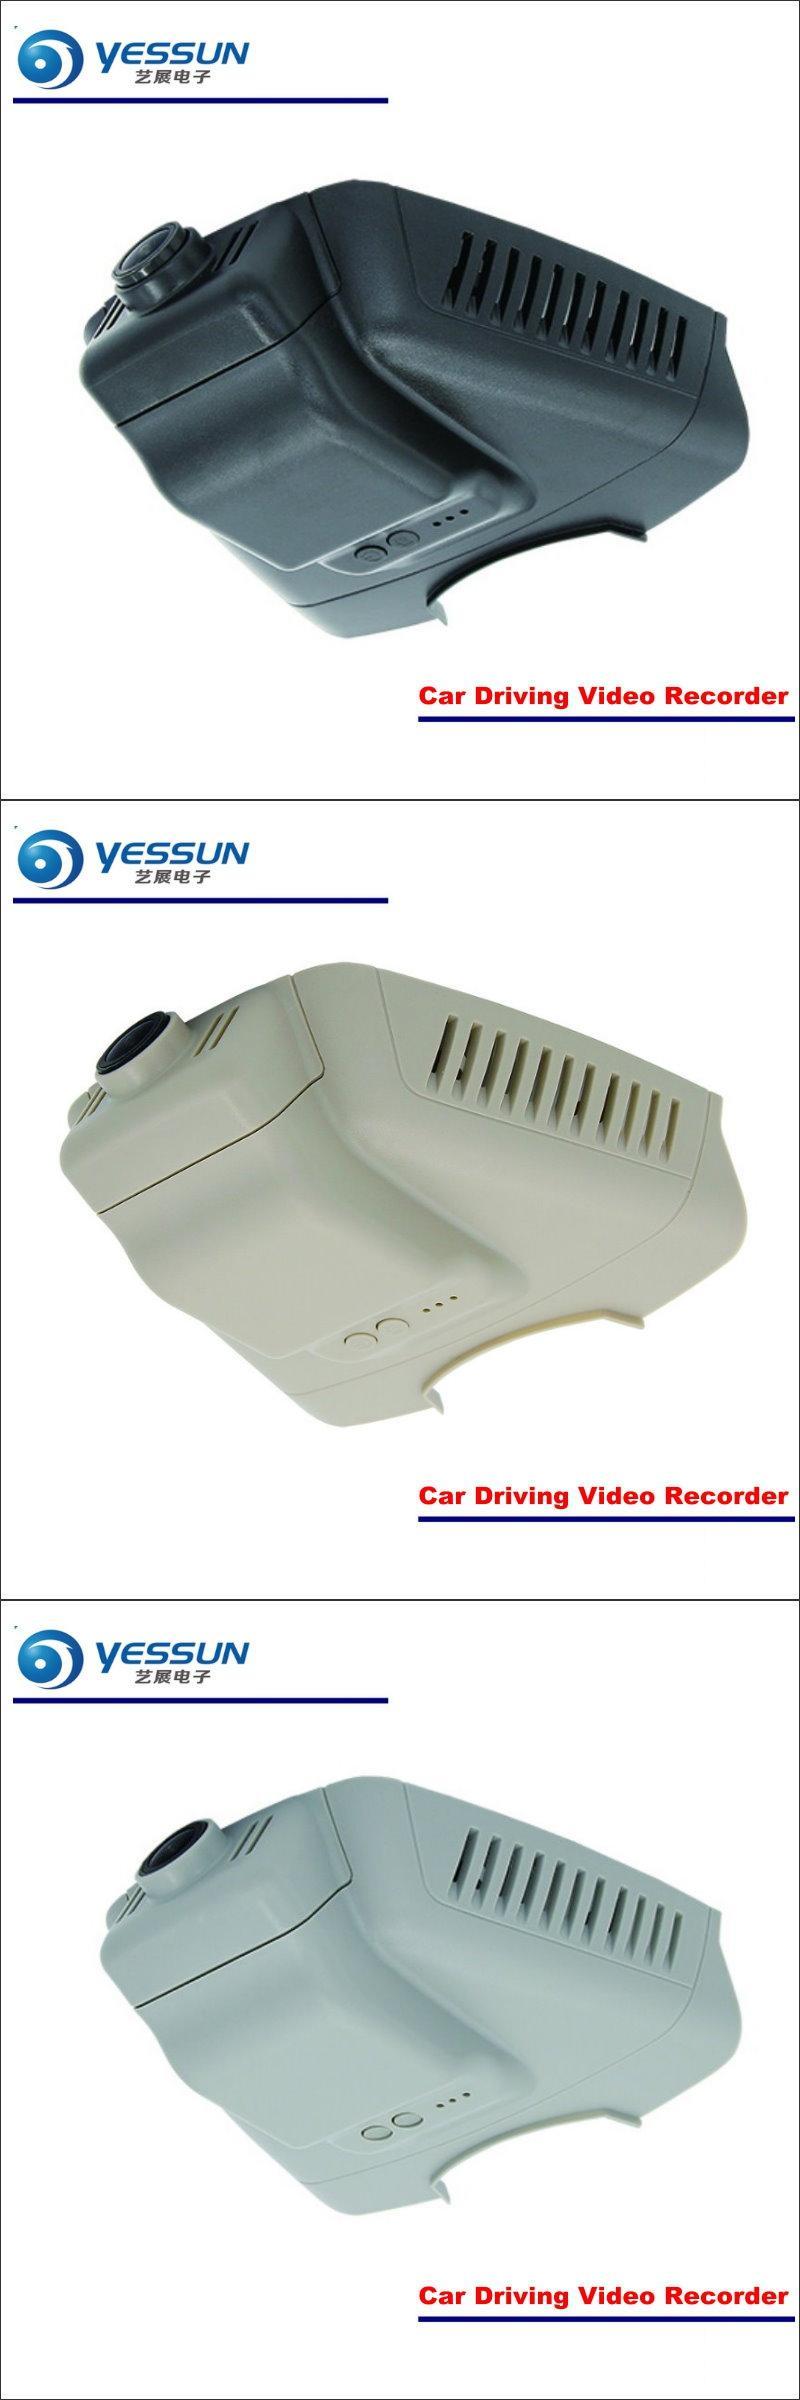 For Mercedes Benz E Class W212 E180 E200 W204 C180 C200 Car Dvr Driving Video Recorder Front Camera Black Box Dash Cam Benz E Class Benz E Dashcam